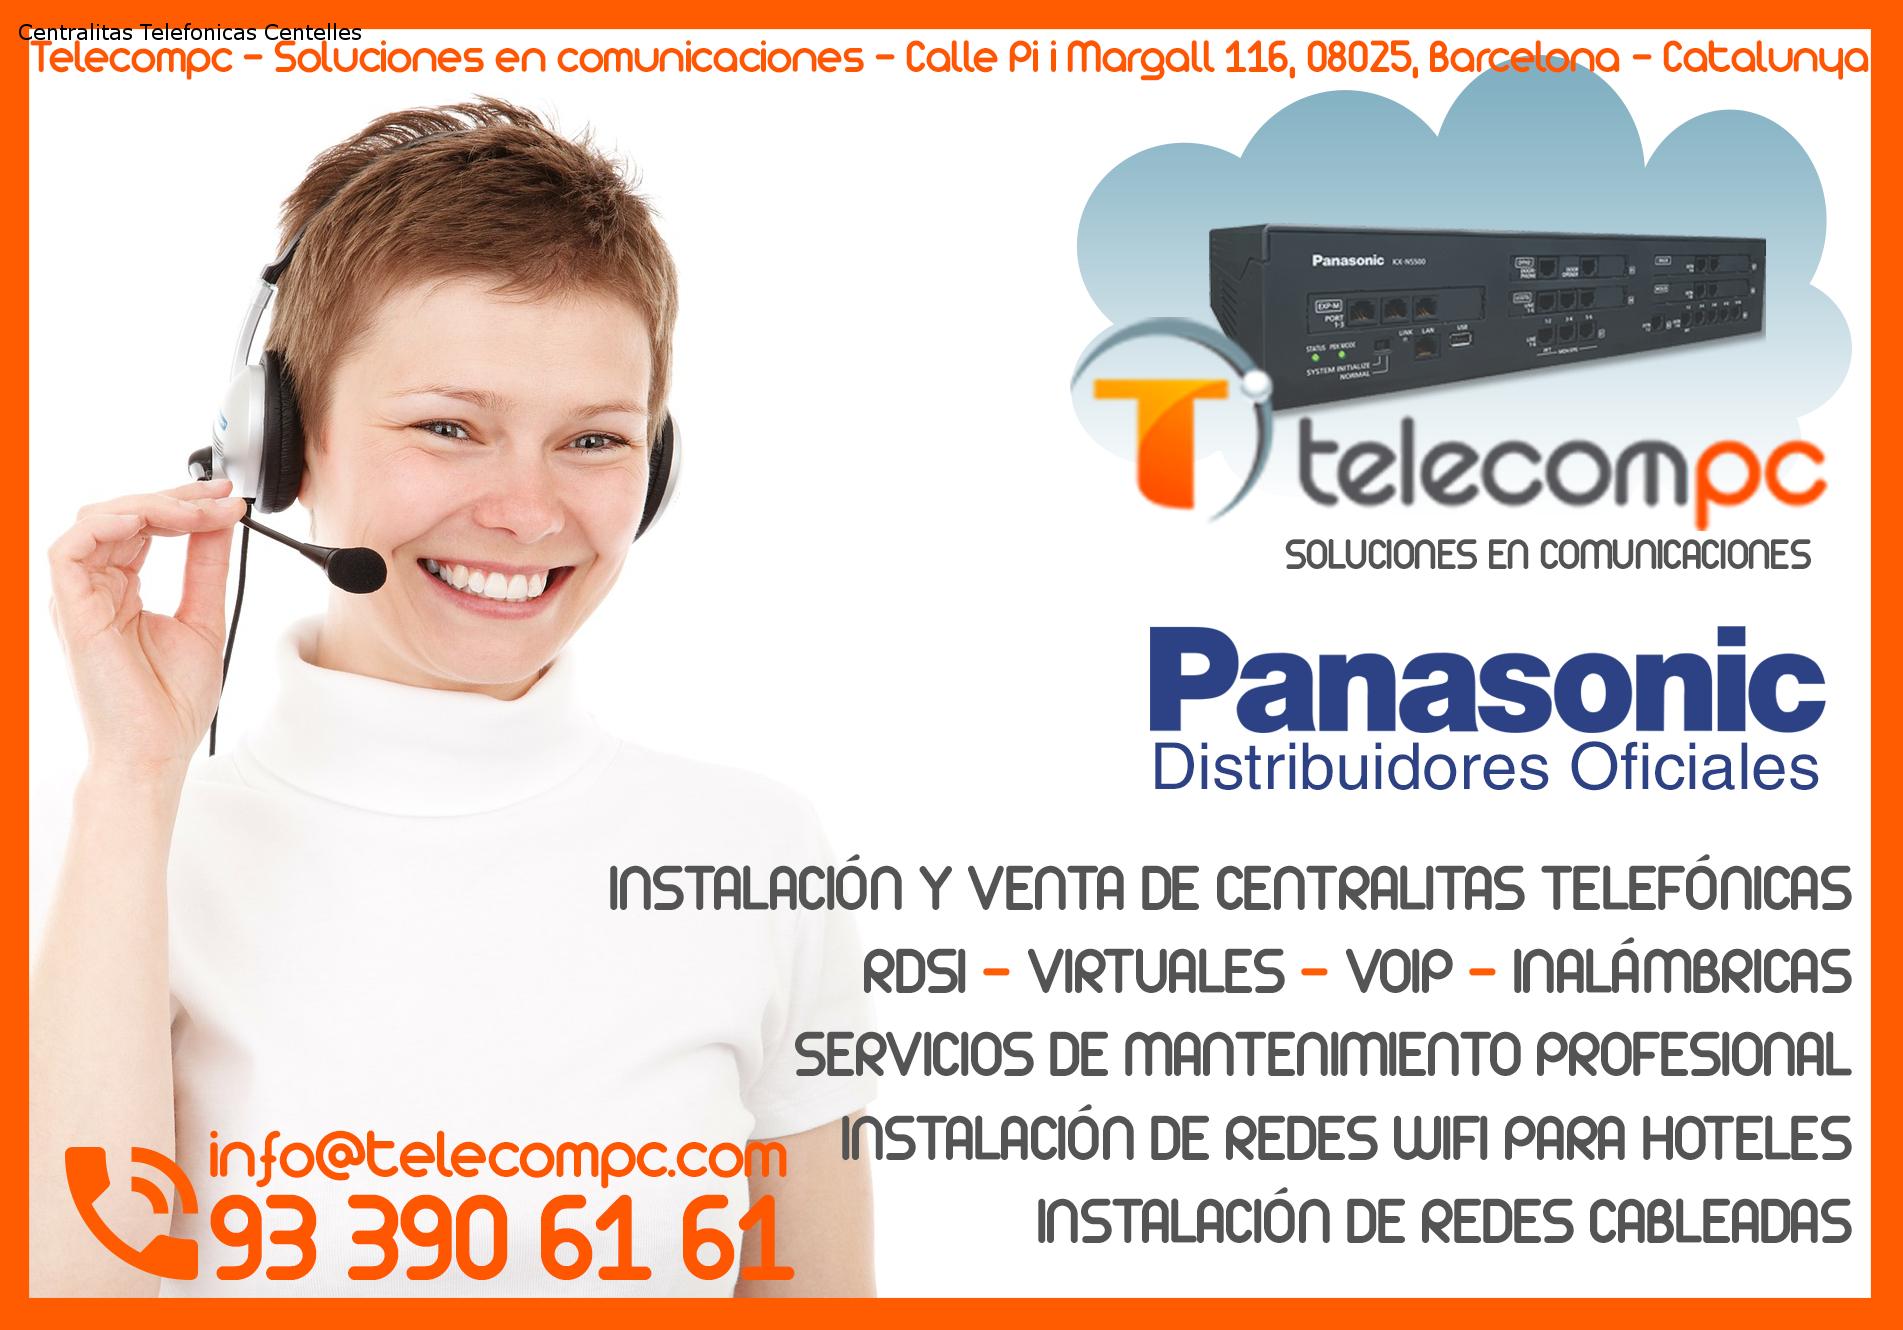 Centralitas Telefonicas Centelles